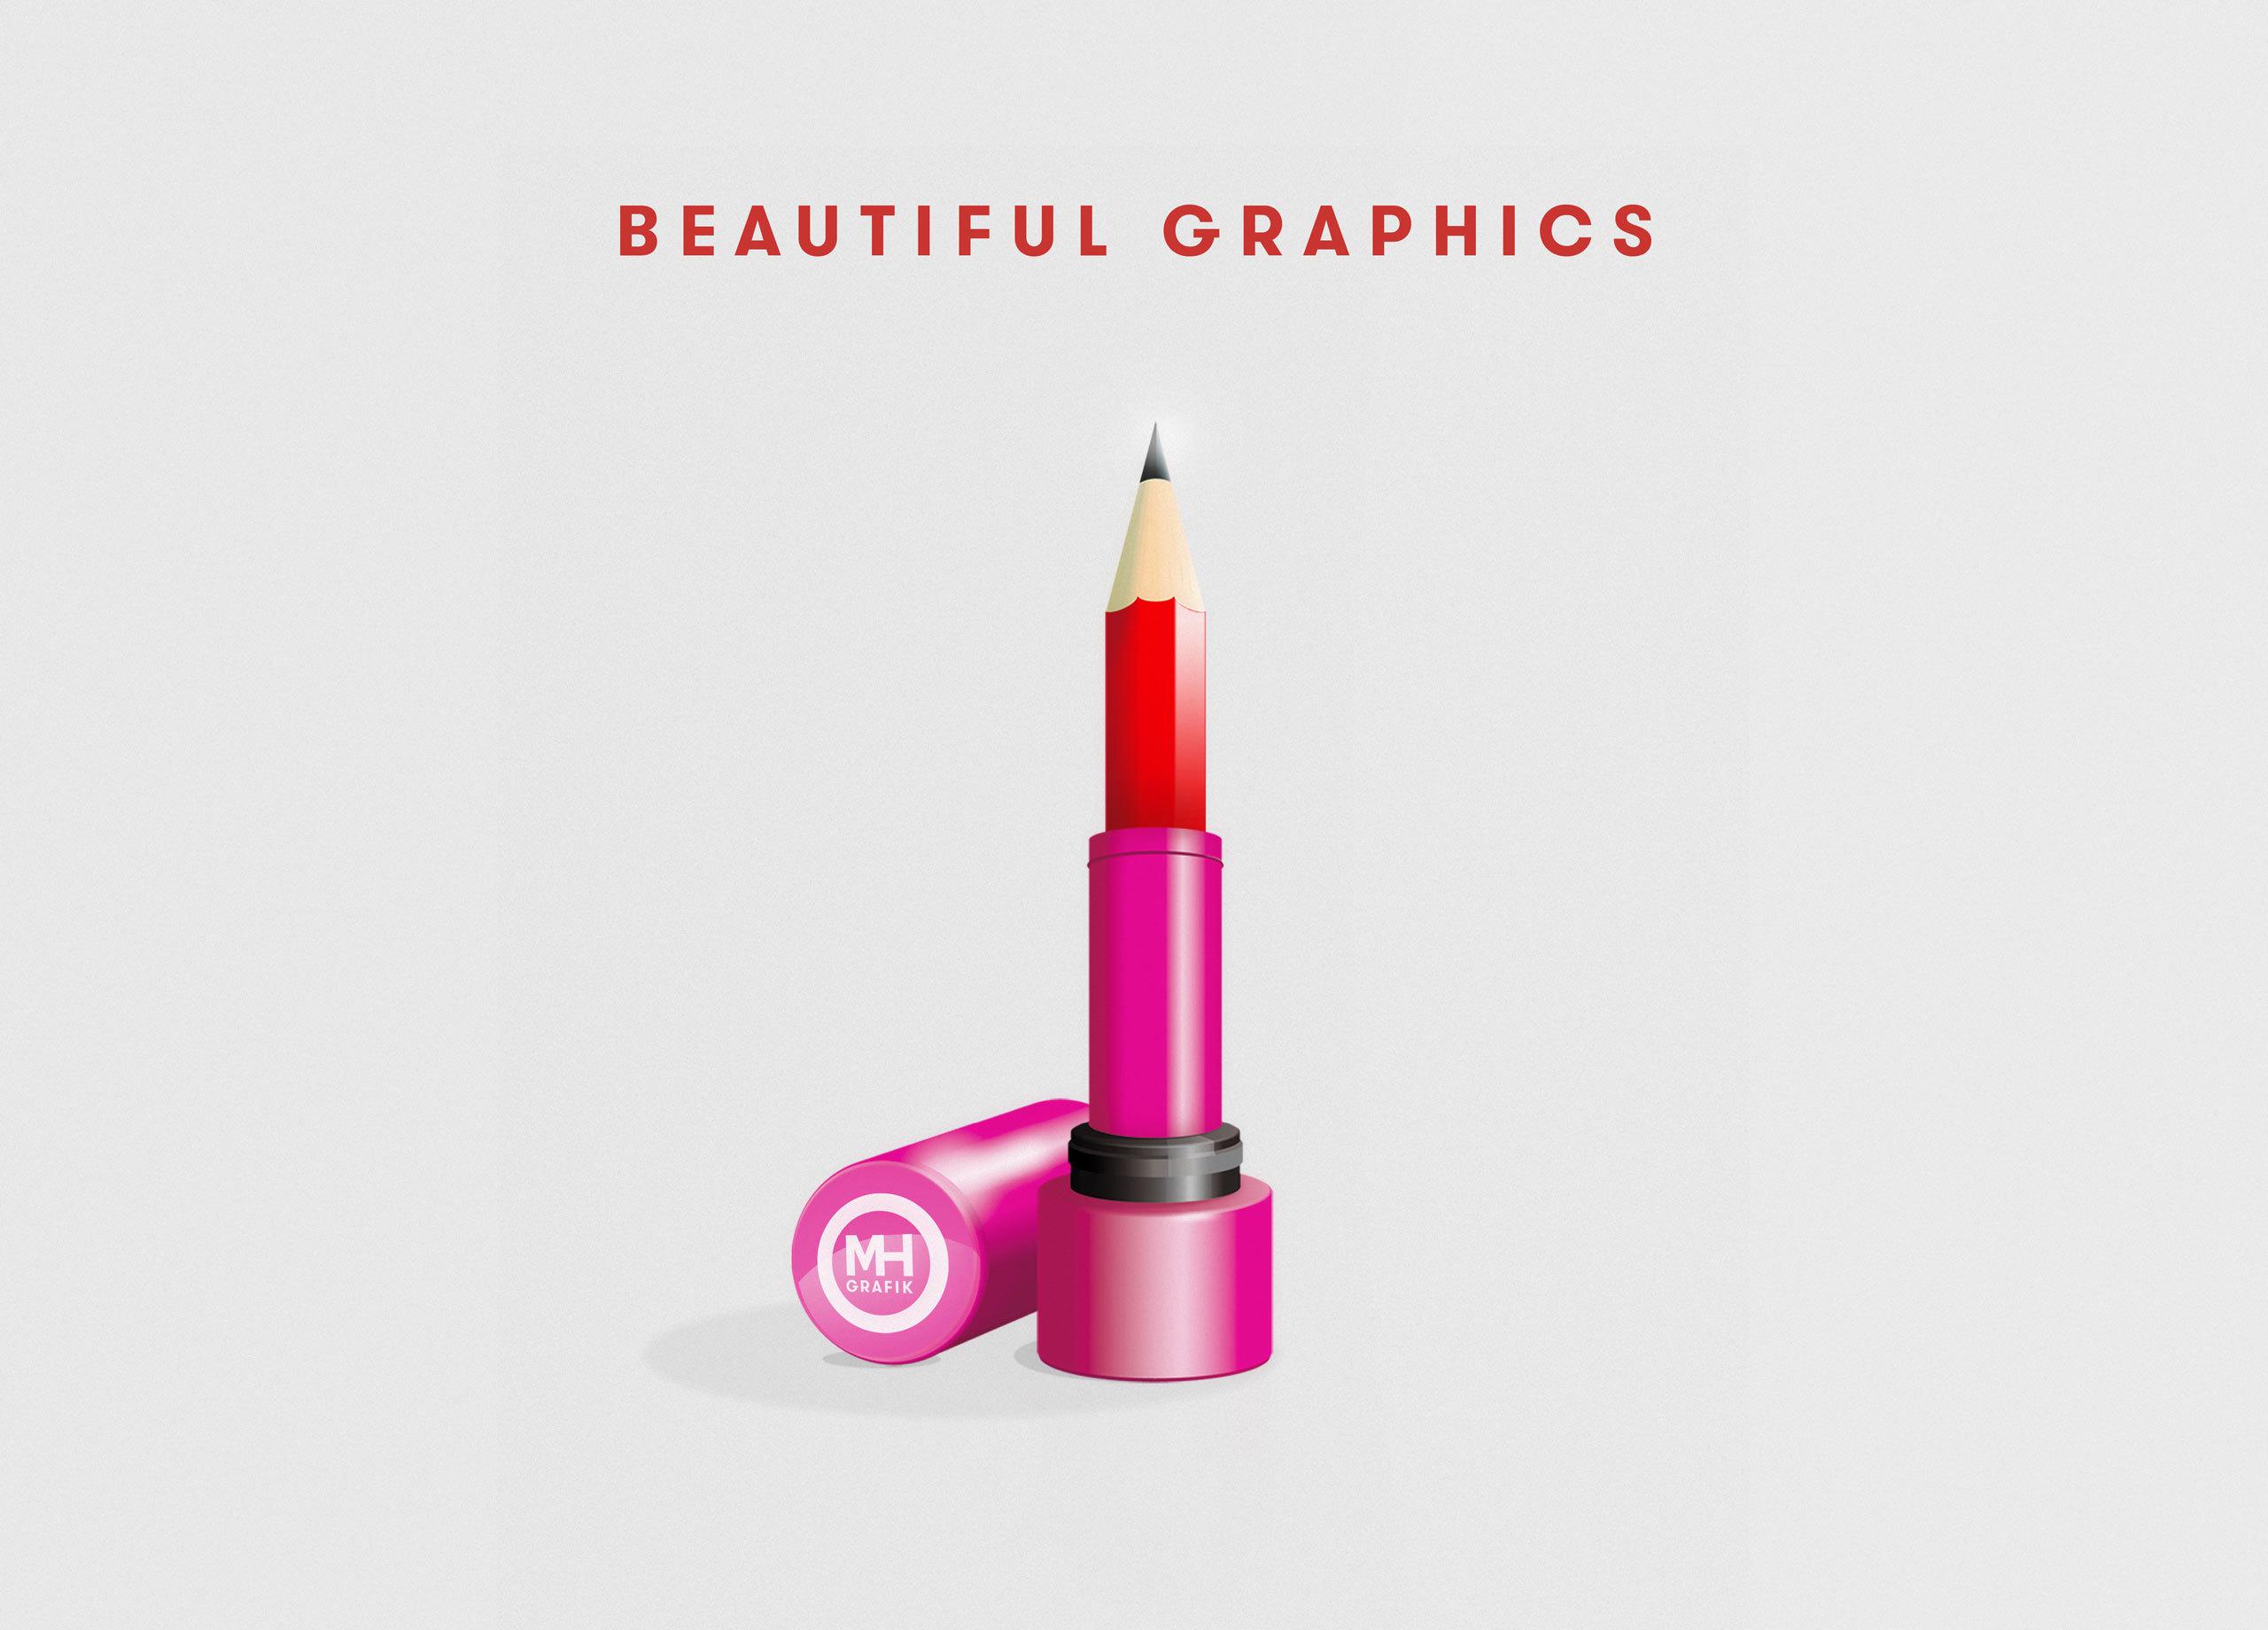 Mh Grafik Beatiful Graphics MHG Bern